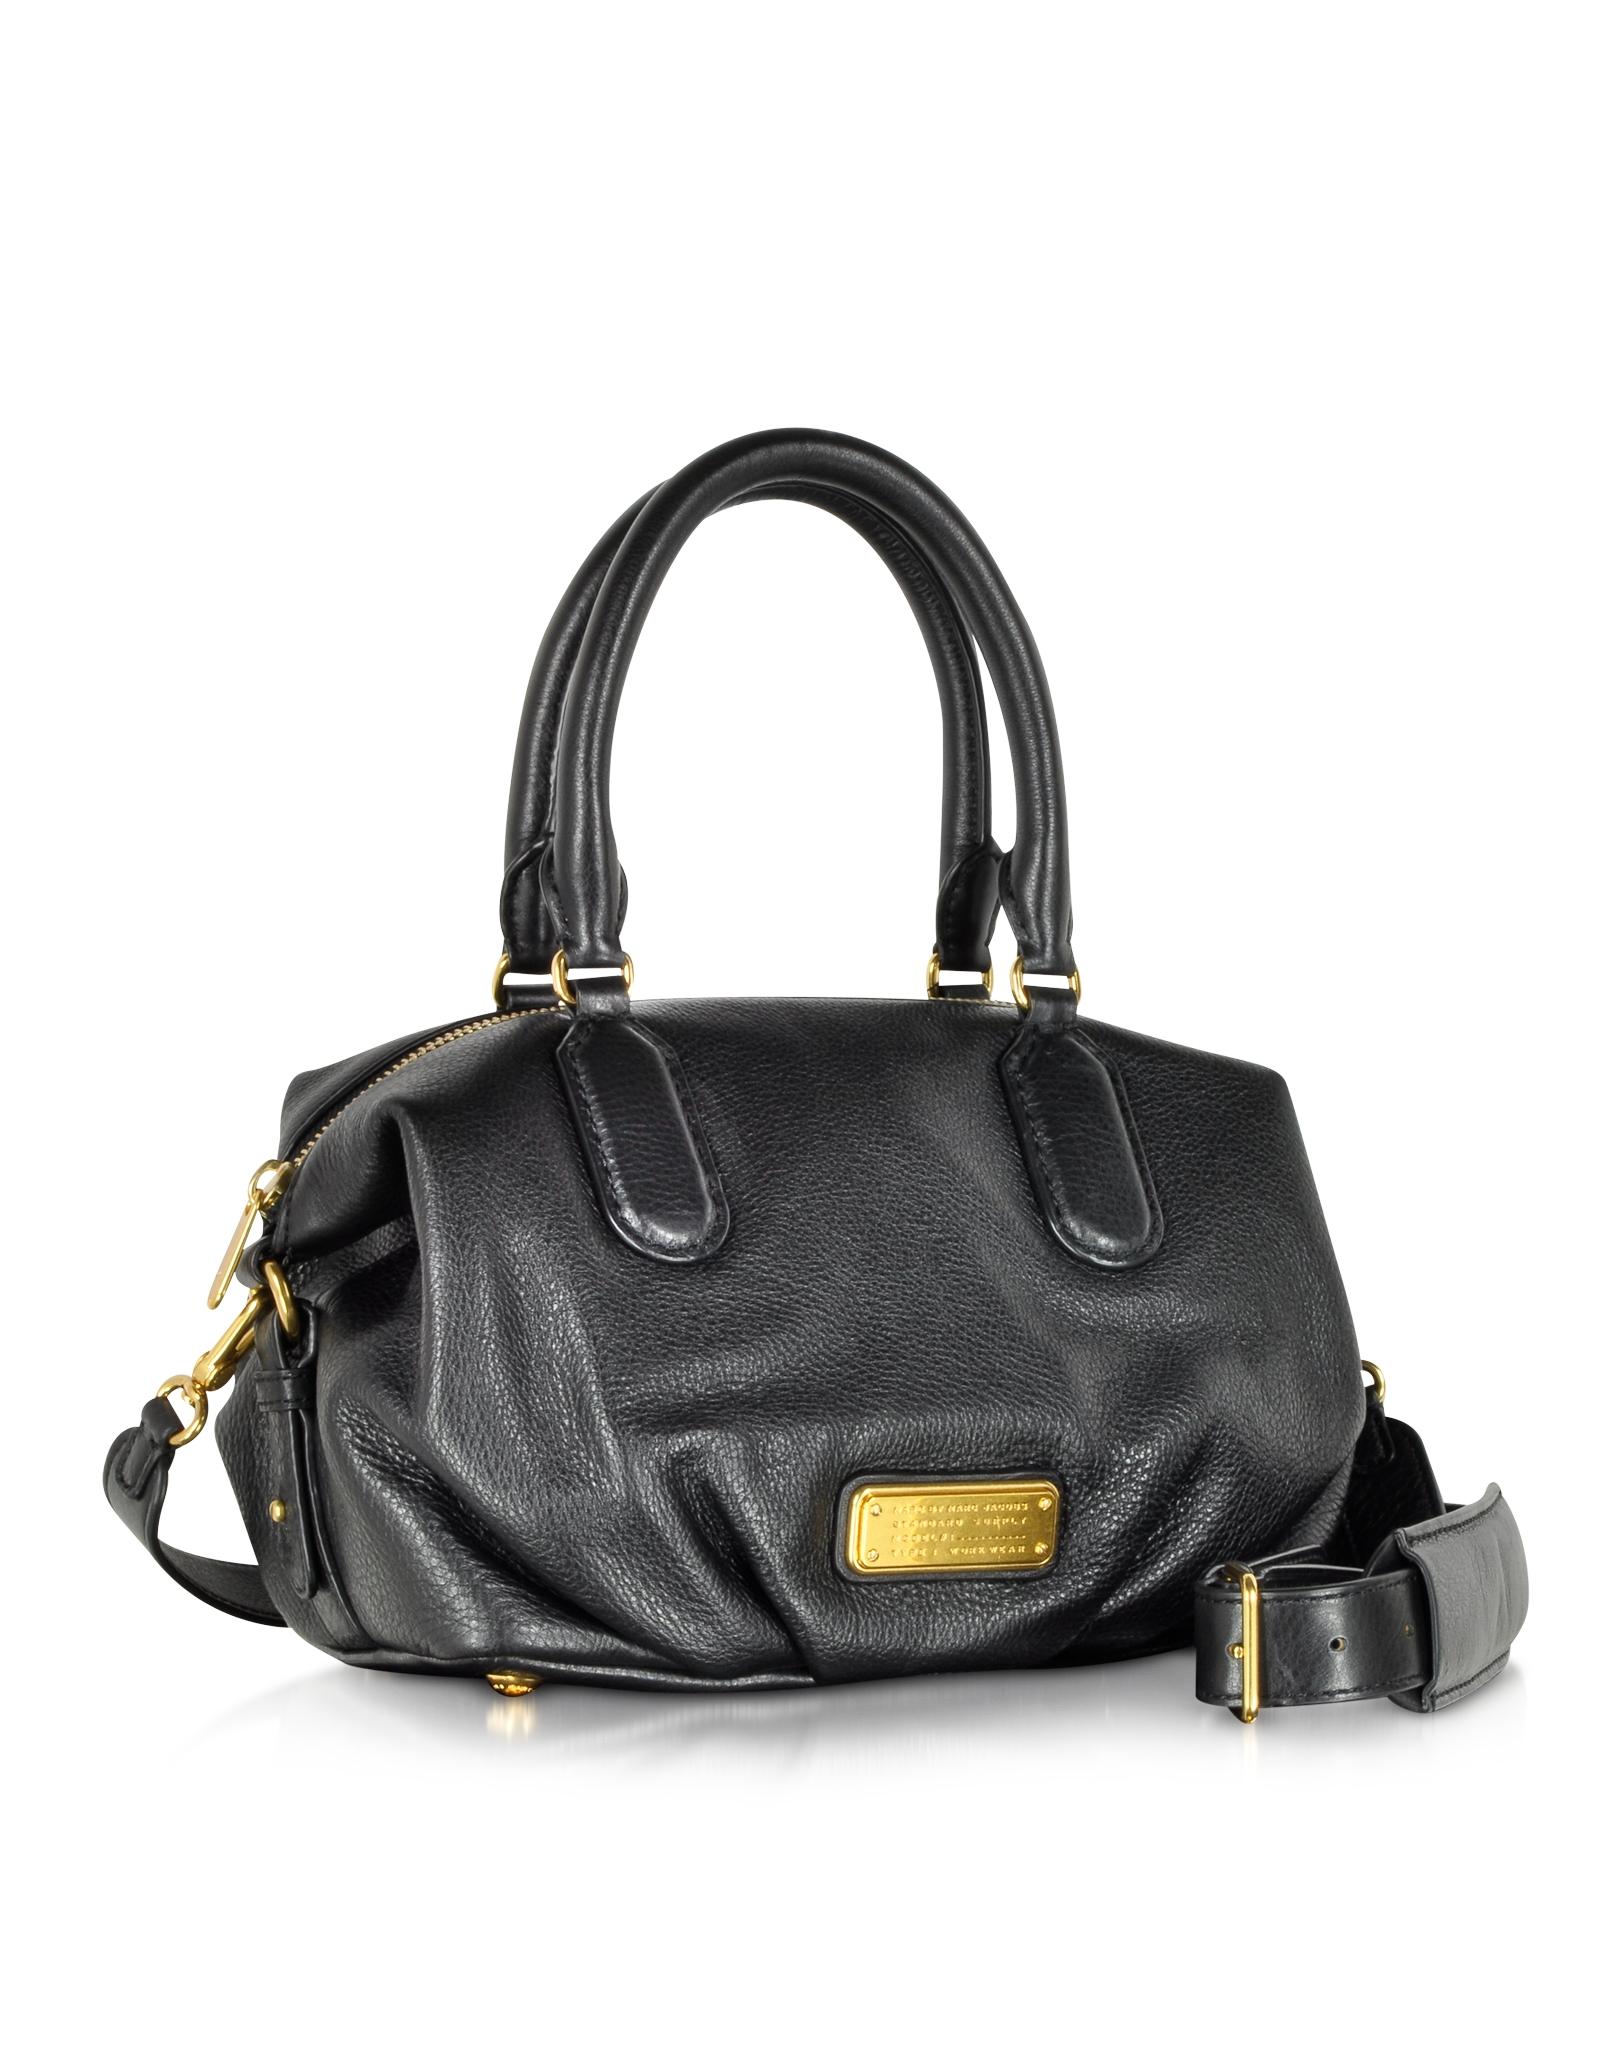 Marc by marc jacobs New Q Small Legend Black Leather Shoulder Bag ...